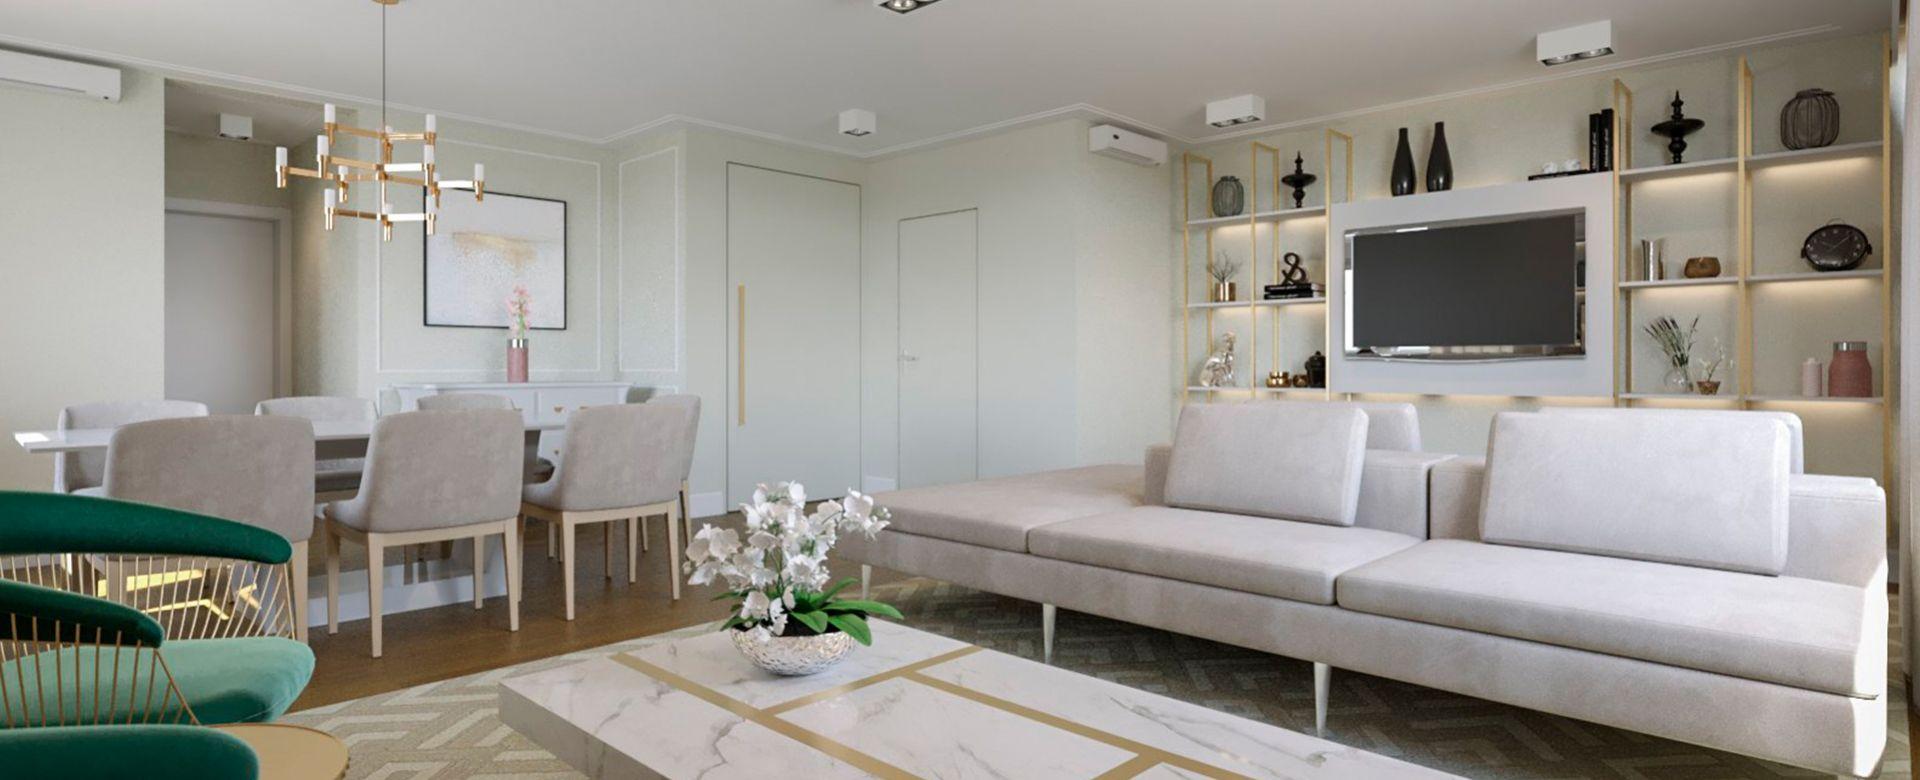 Imagem destaque do Edifício Palacete Papillon